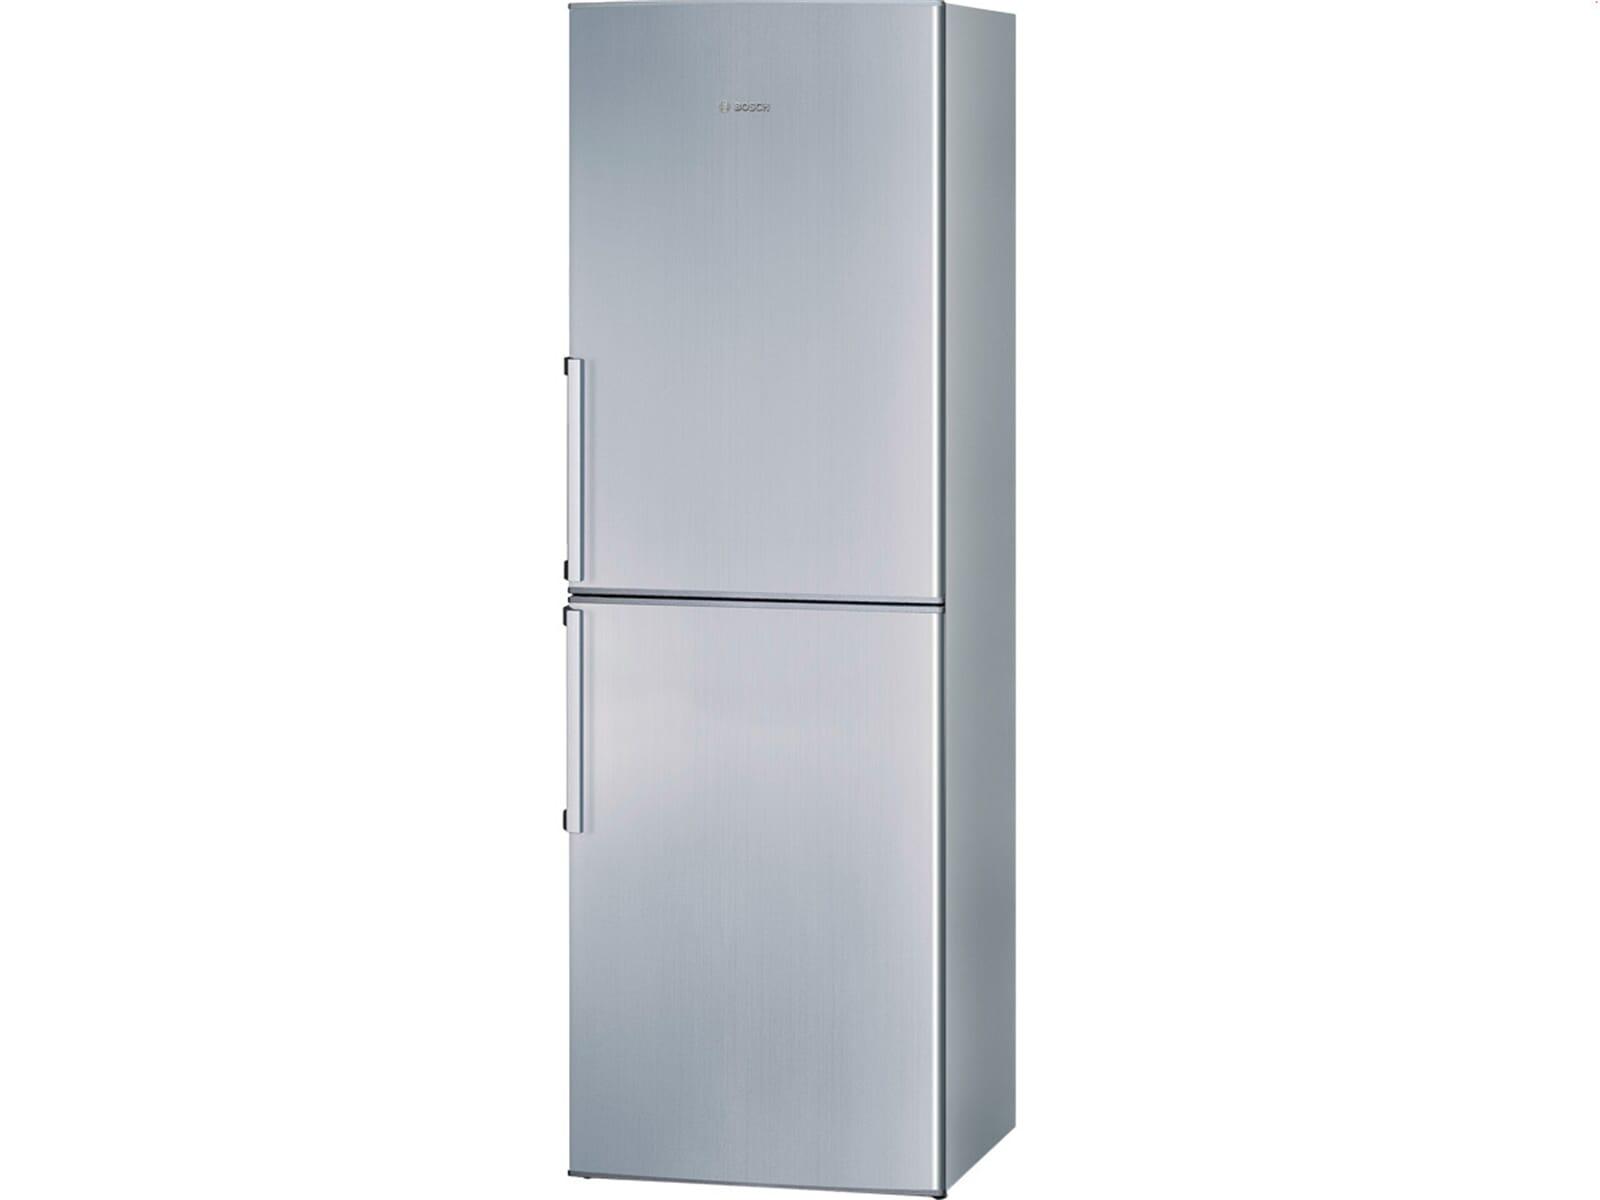 Bosch Kühlschrank Kgn 36 Xi 45 : Bosch kgn34x44 kühl gefrierkombination edelstahl optik